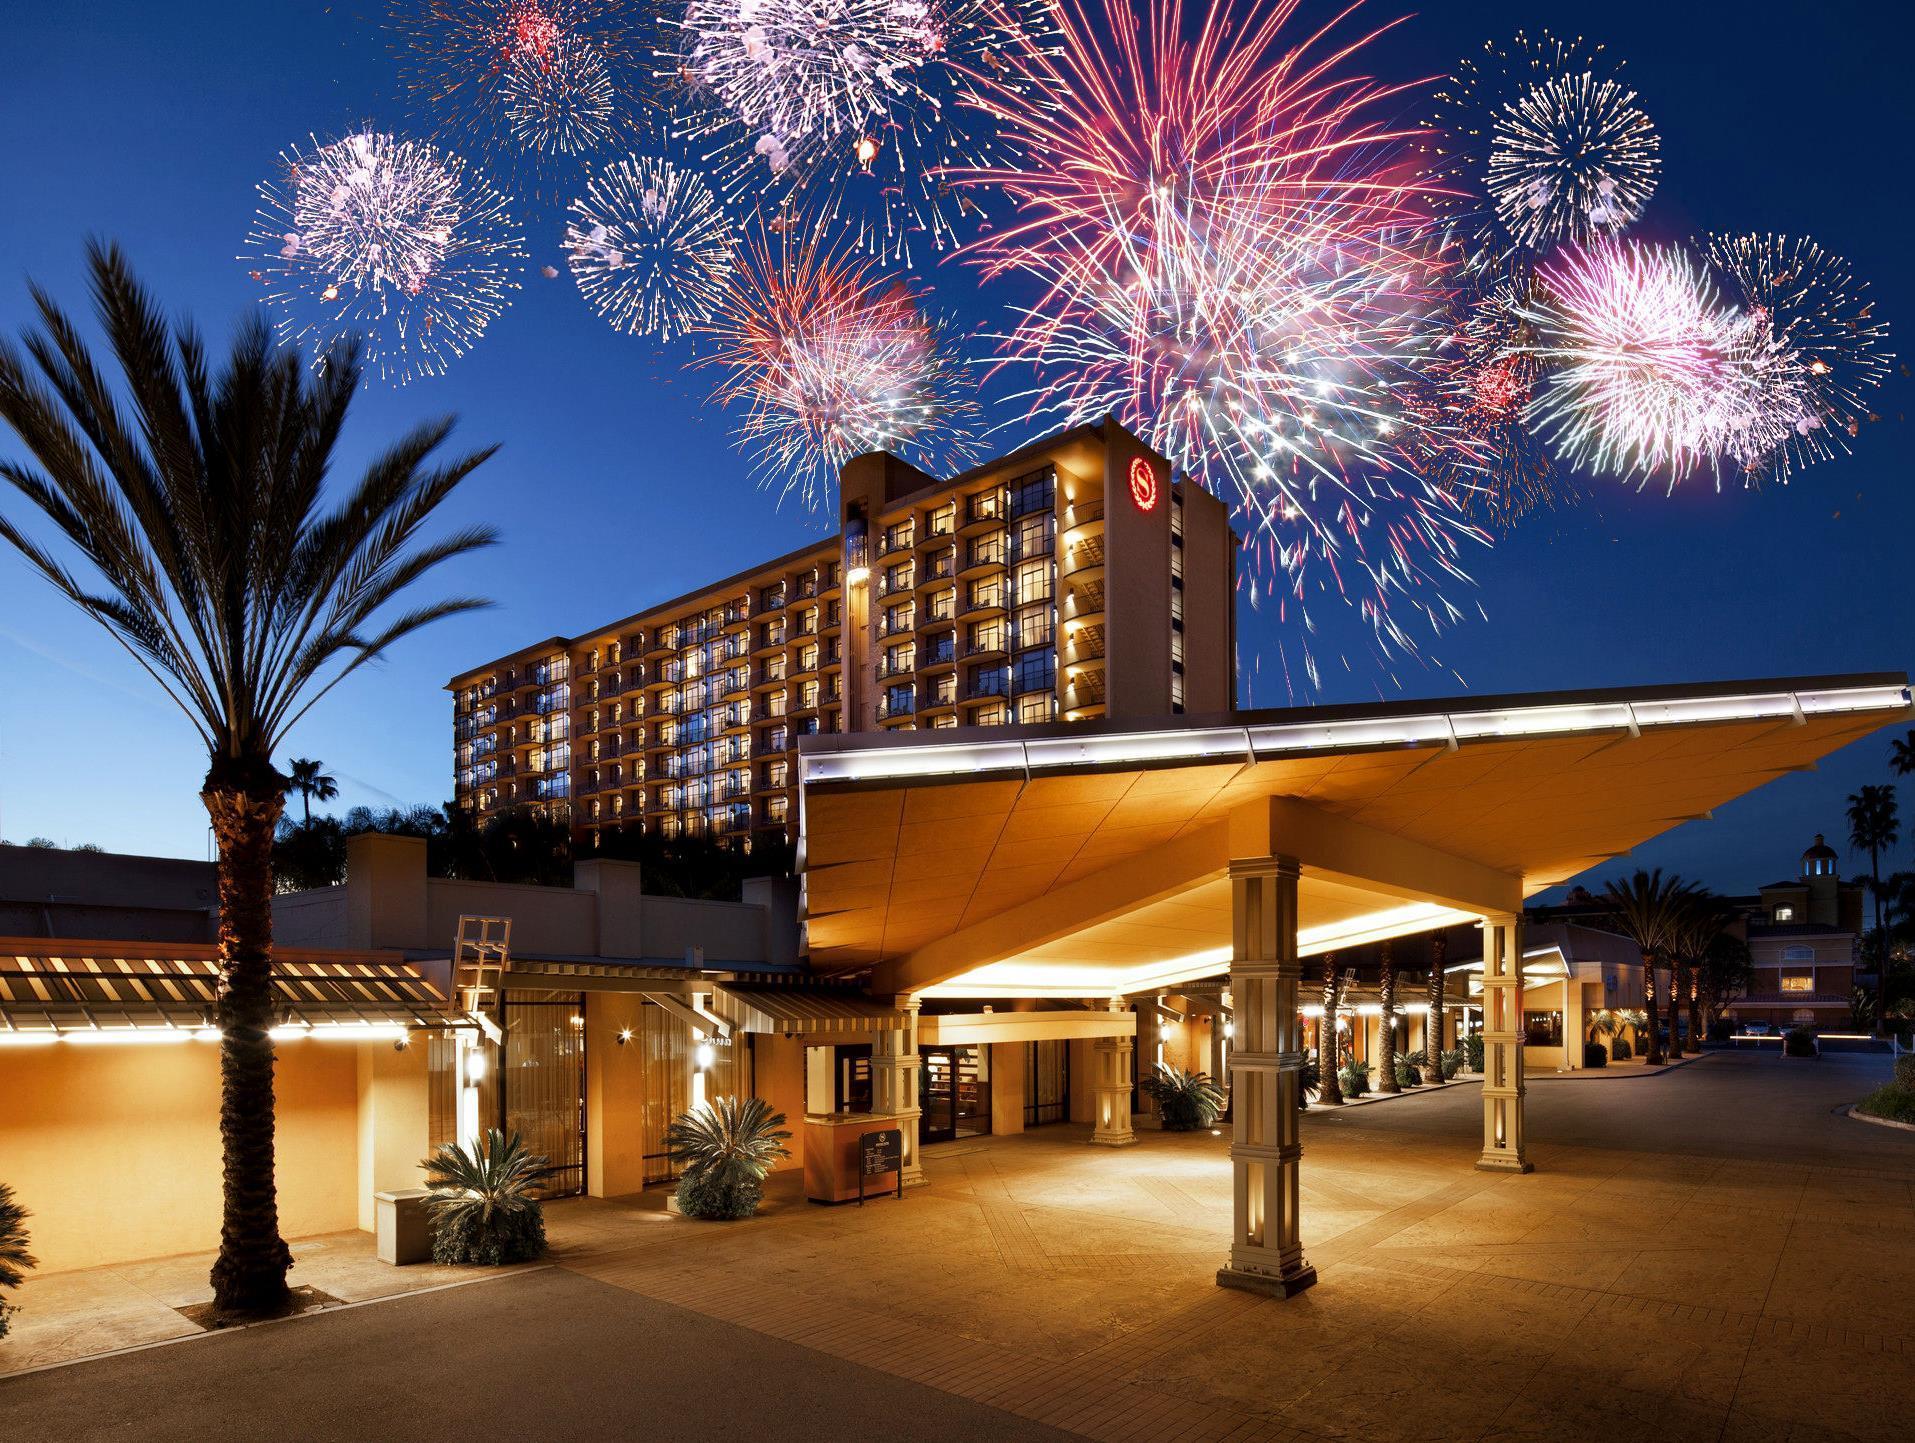 Sheraton Park Hotel at the Anaheim Resort image